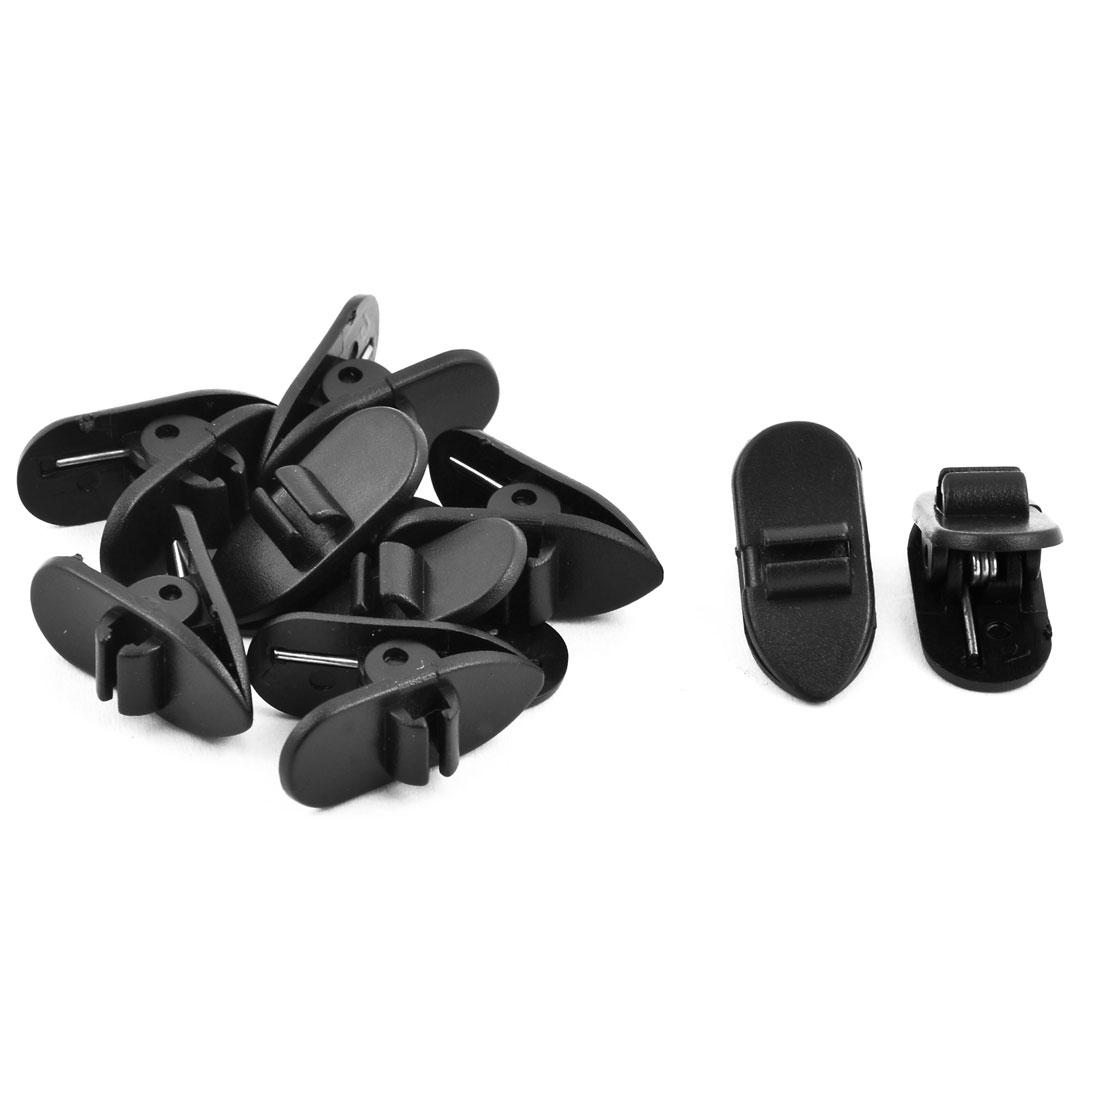 Earphone Headset Plastic Rotate Mount Cable Clothing Clip Organizer Black 9pcs